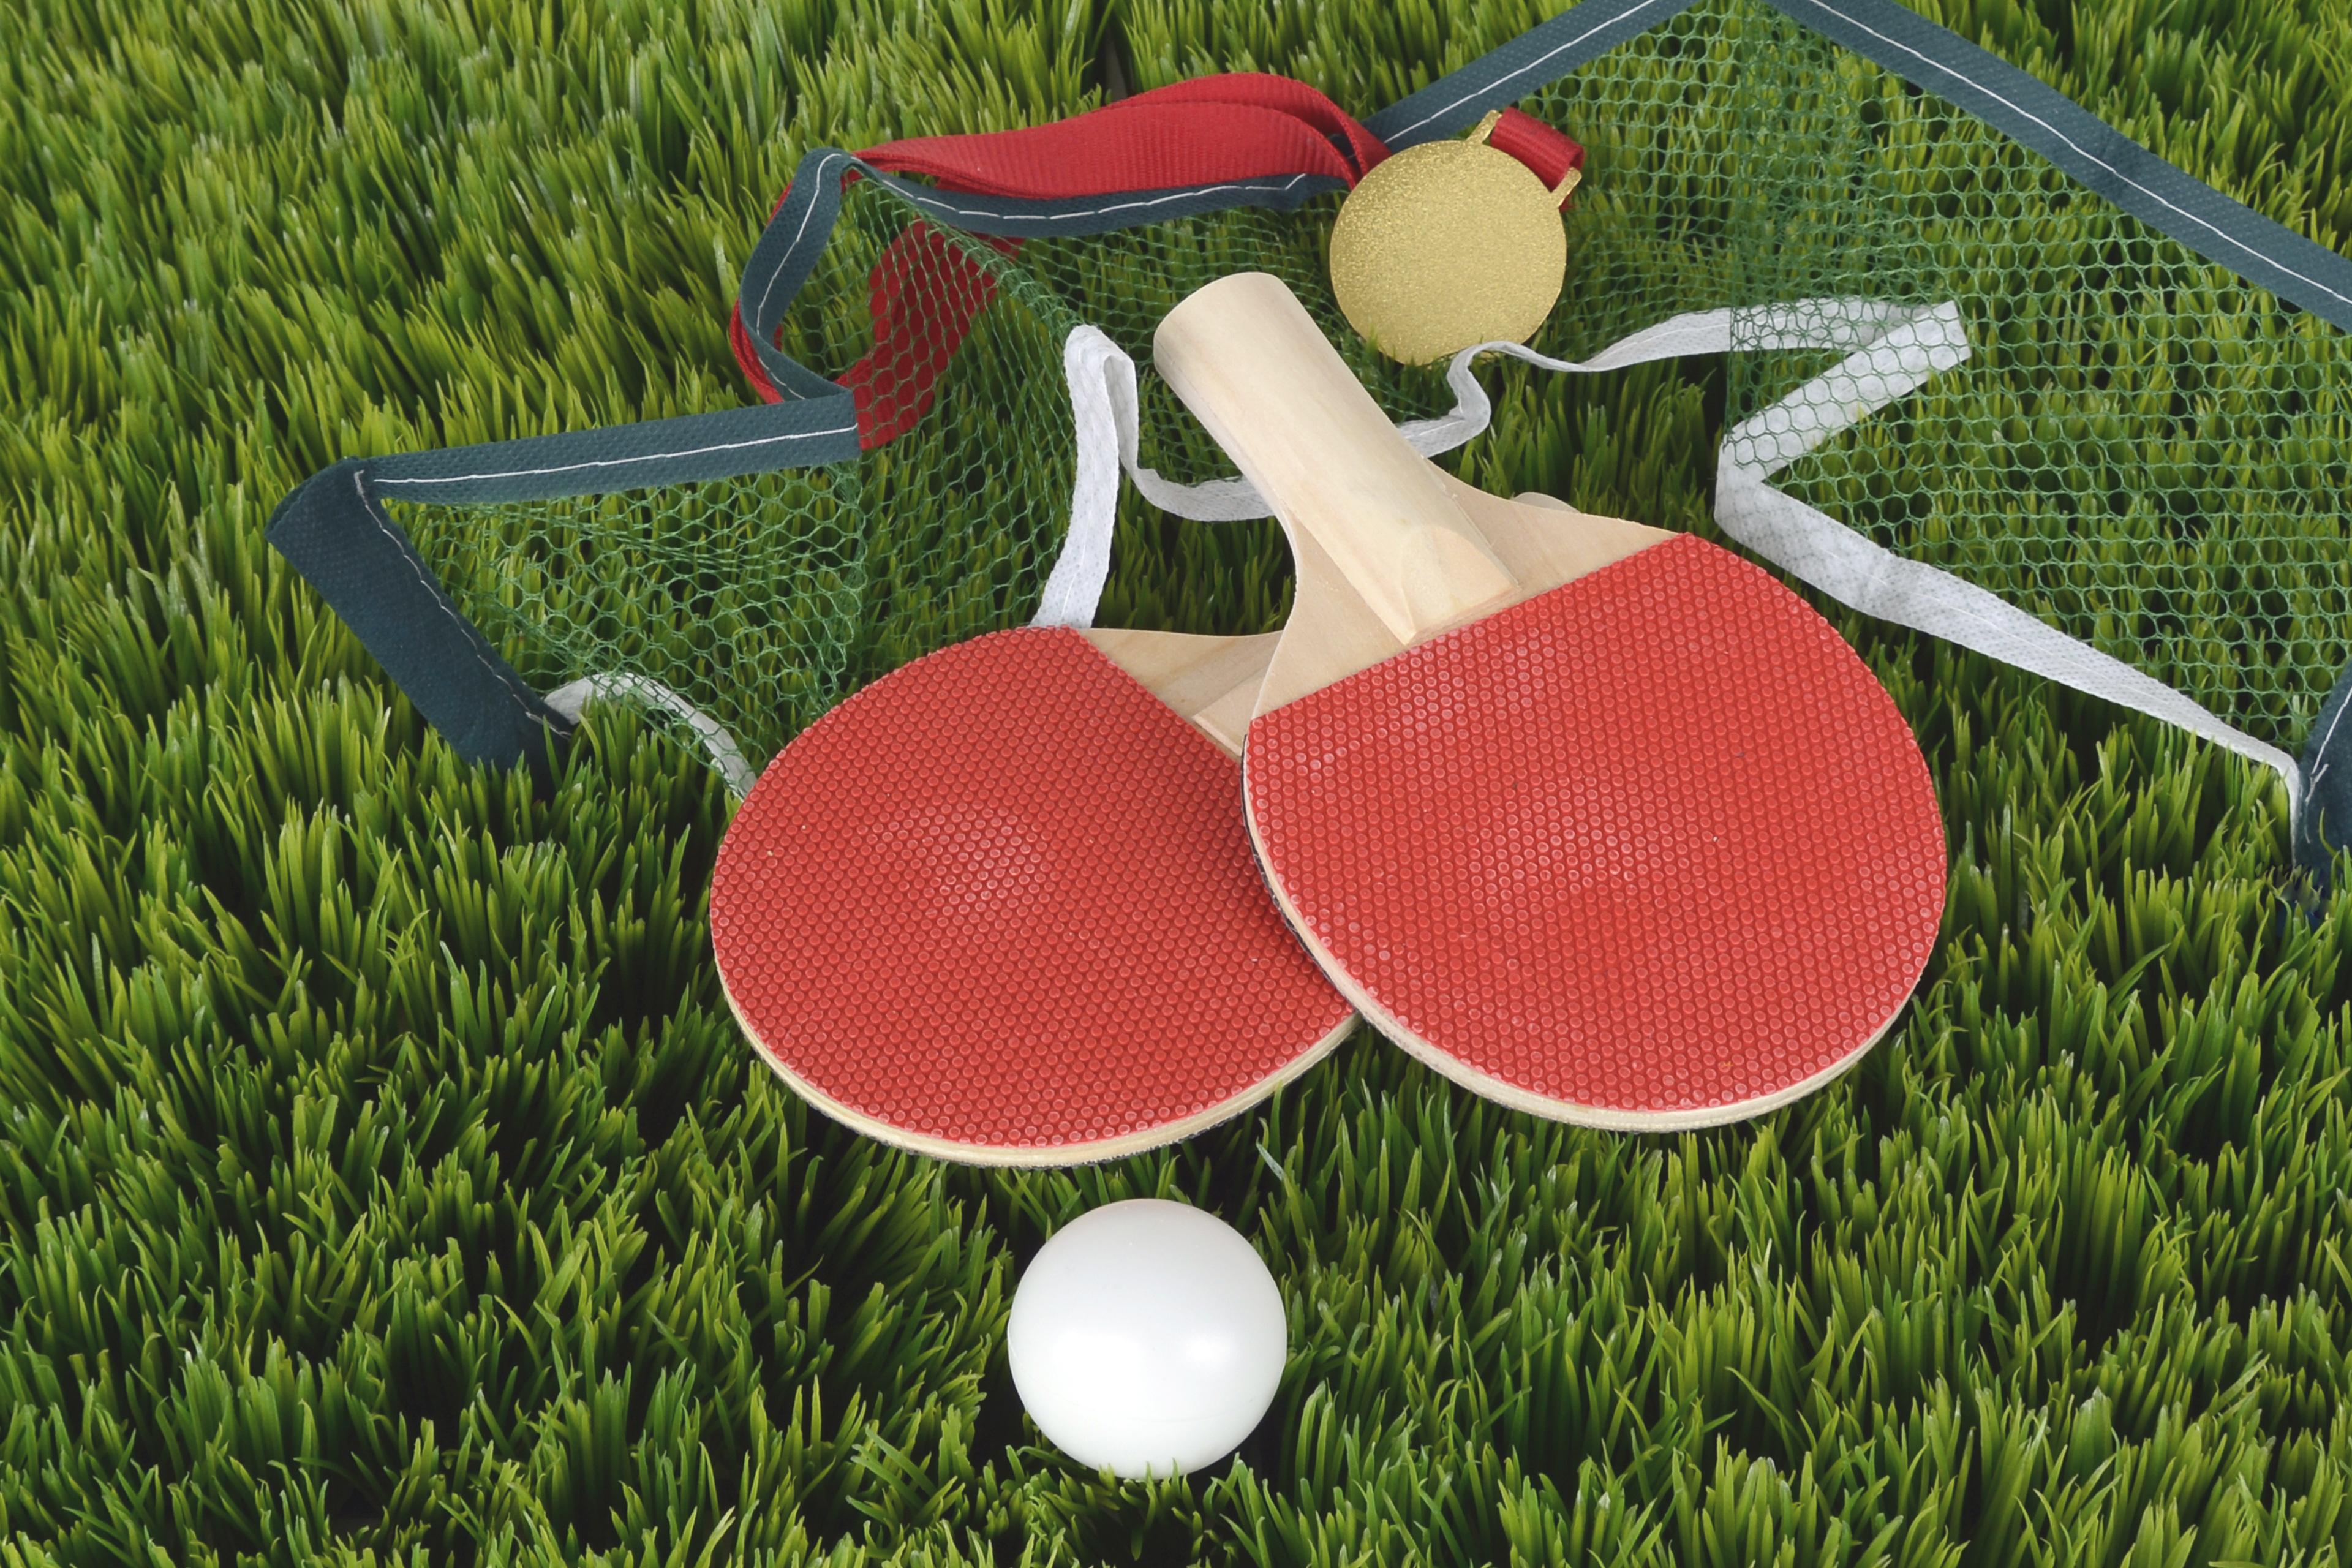 SPORT: Tischtennis, inklusive